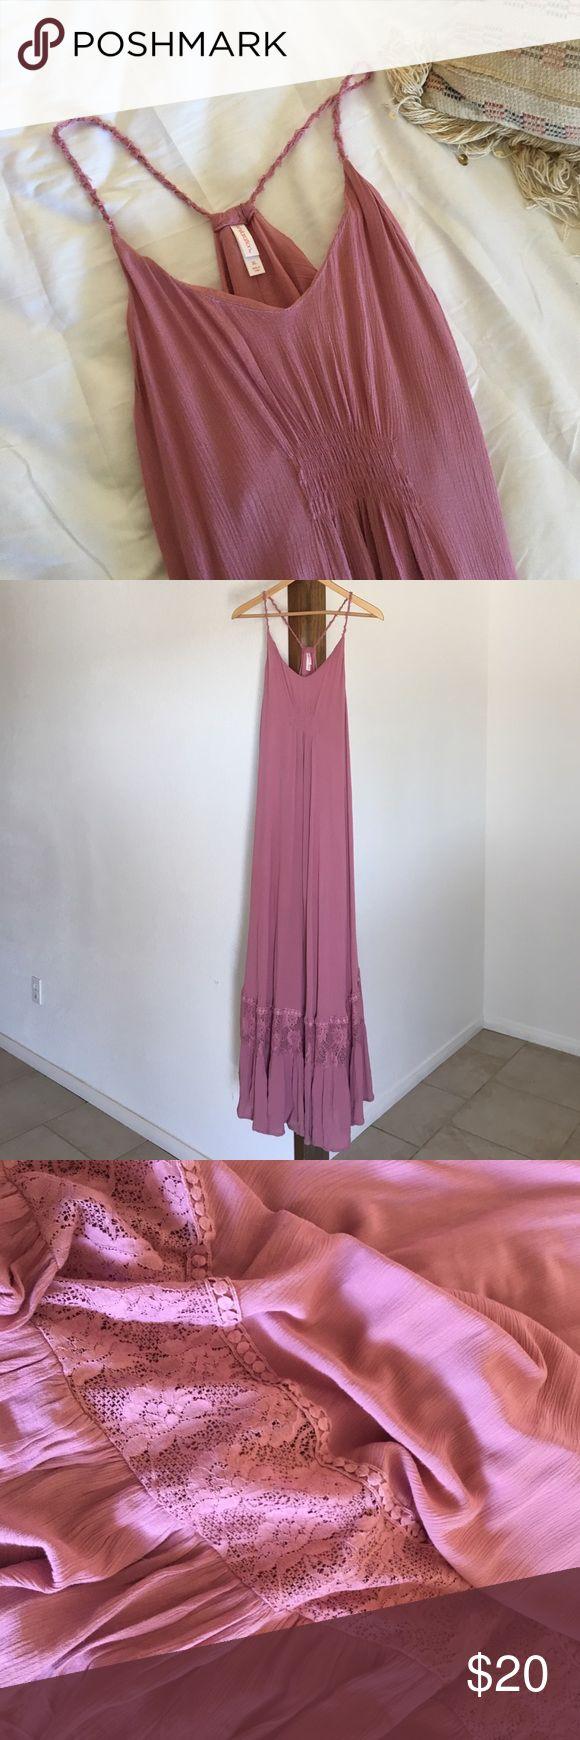 Maxi dress Blush pink maxi dress from target (xhilaration) size XL. Super cute I've only worn once Xhilaration Dresses Maxi